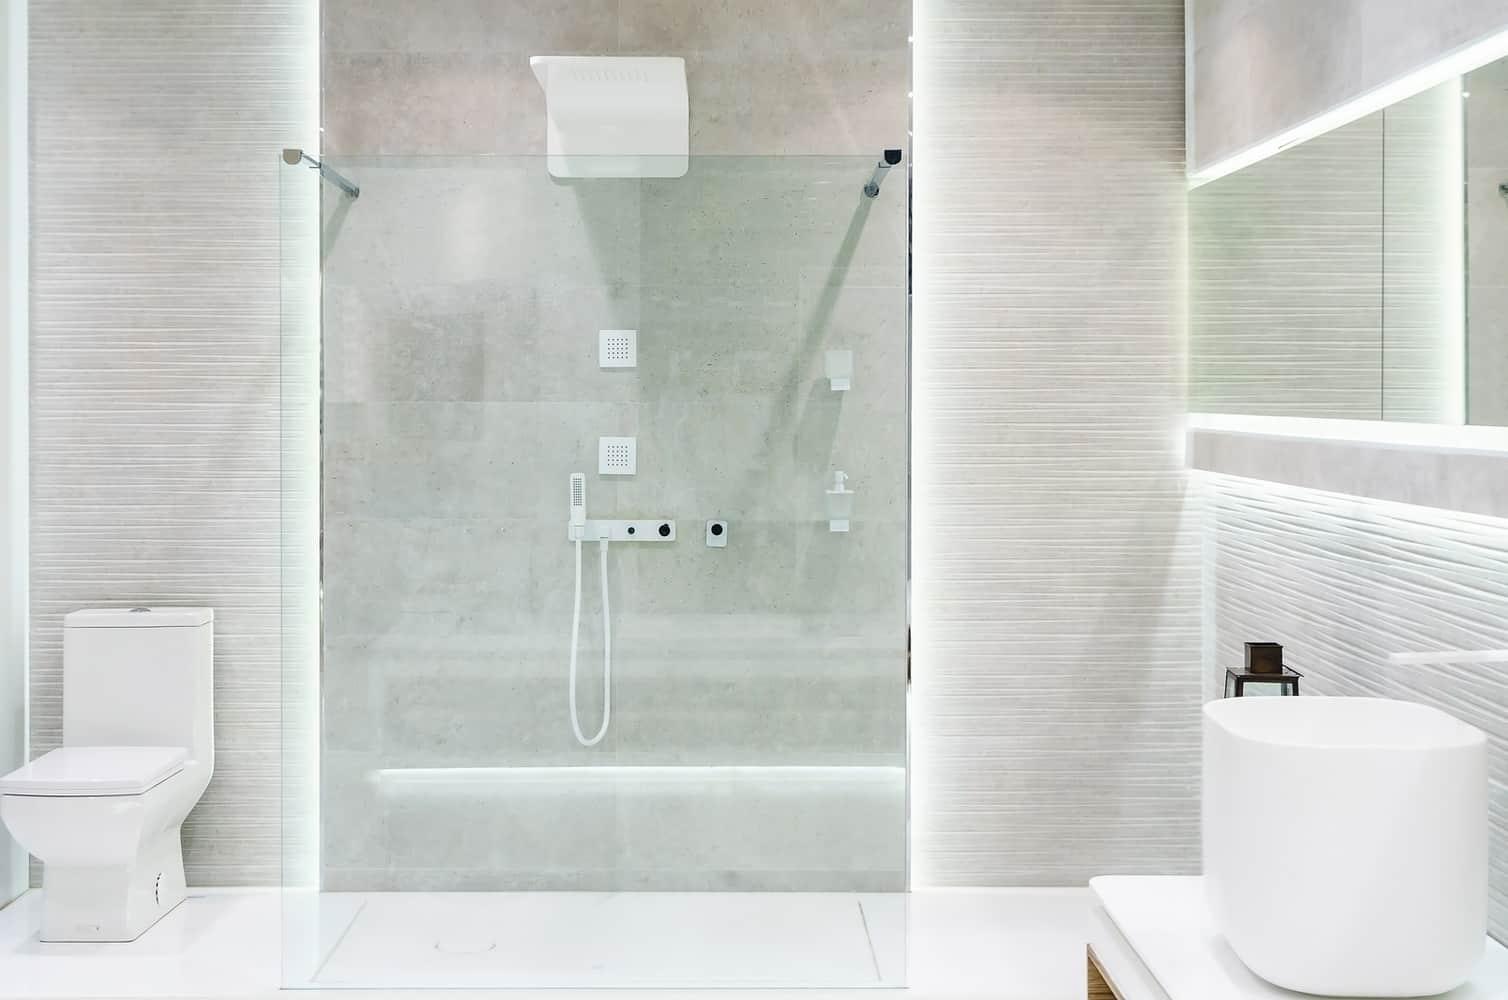 travaux d 39 installation de receveur de douche activbatisseurs. Black Bedroom Furniture Sets. Home Design Ideas